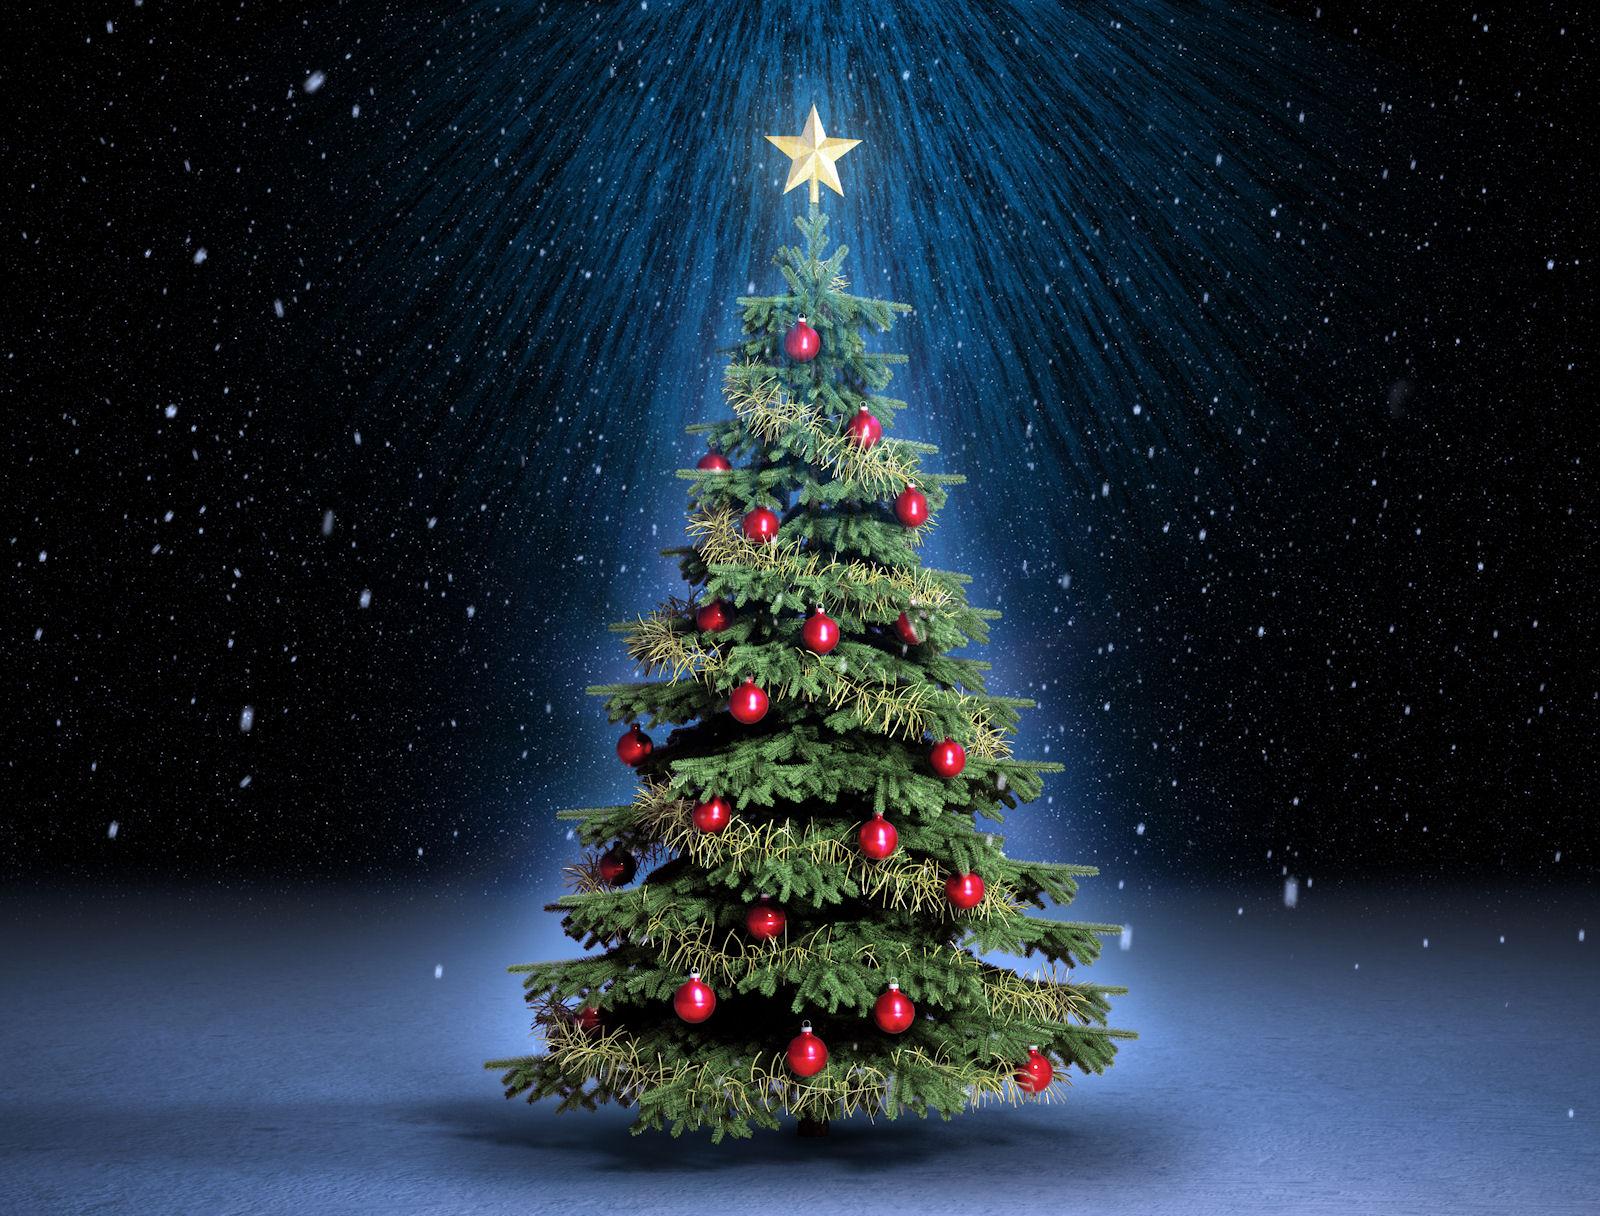 Pgina de Navidad